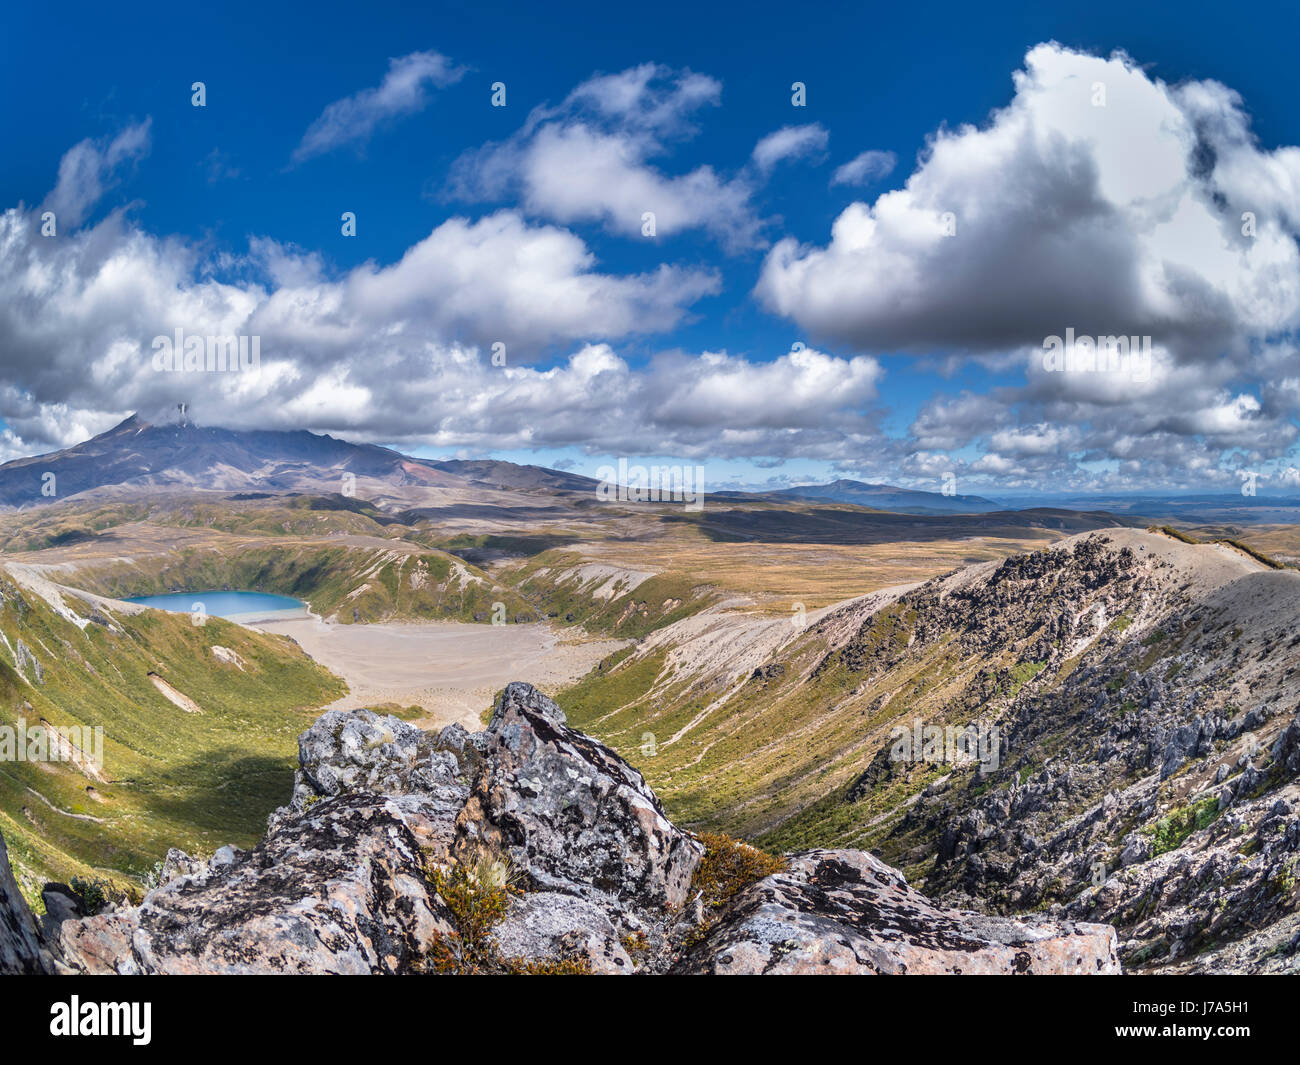 New Zealand, Ruapehu District, Tongariro National Park, Lower Tamer Lake, Mount Ruapehu, Mount Te Heuheu - Stock Image